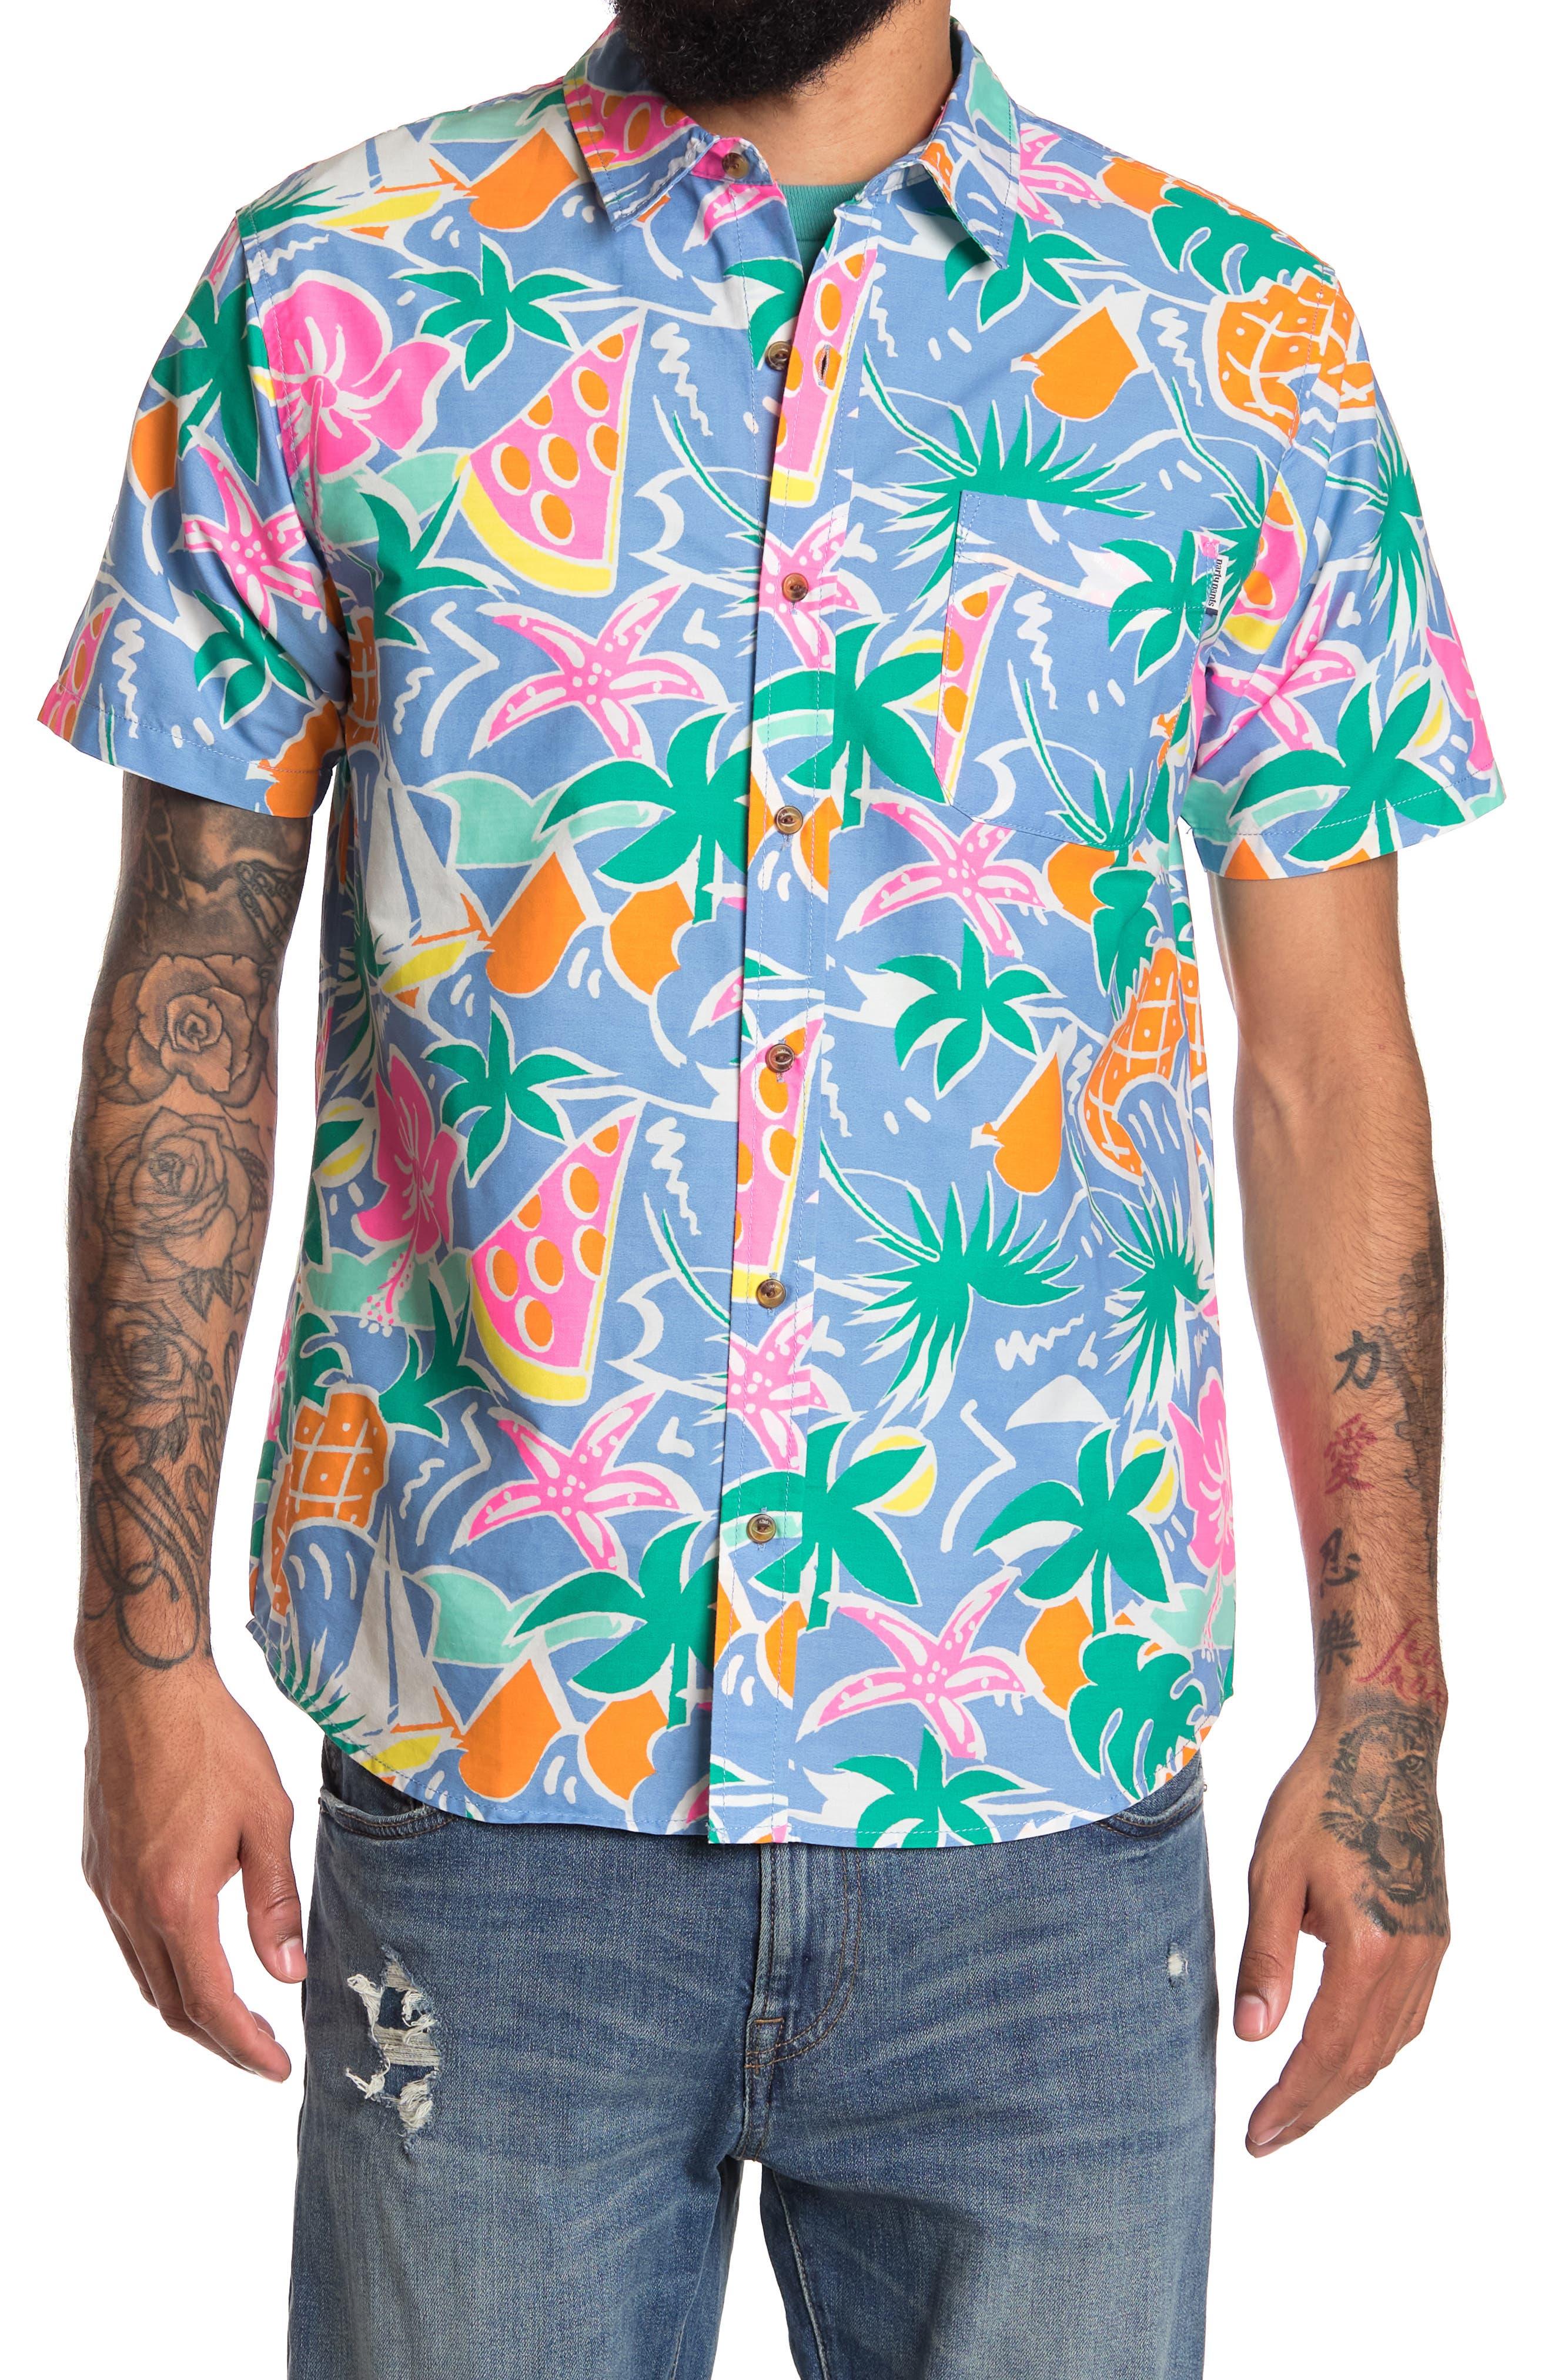 80s Men's Shirts, T-shirts, Retro Shirts PARTY PANTS Tropical Print Short Sleeve Shirt Size XXL - Blue at Nordstrom Rack $29.97 AT vintagedancer.com